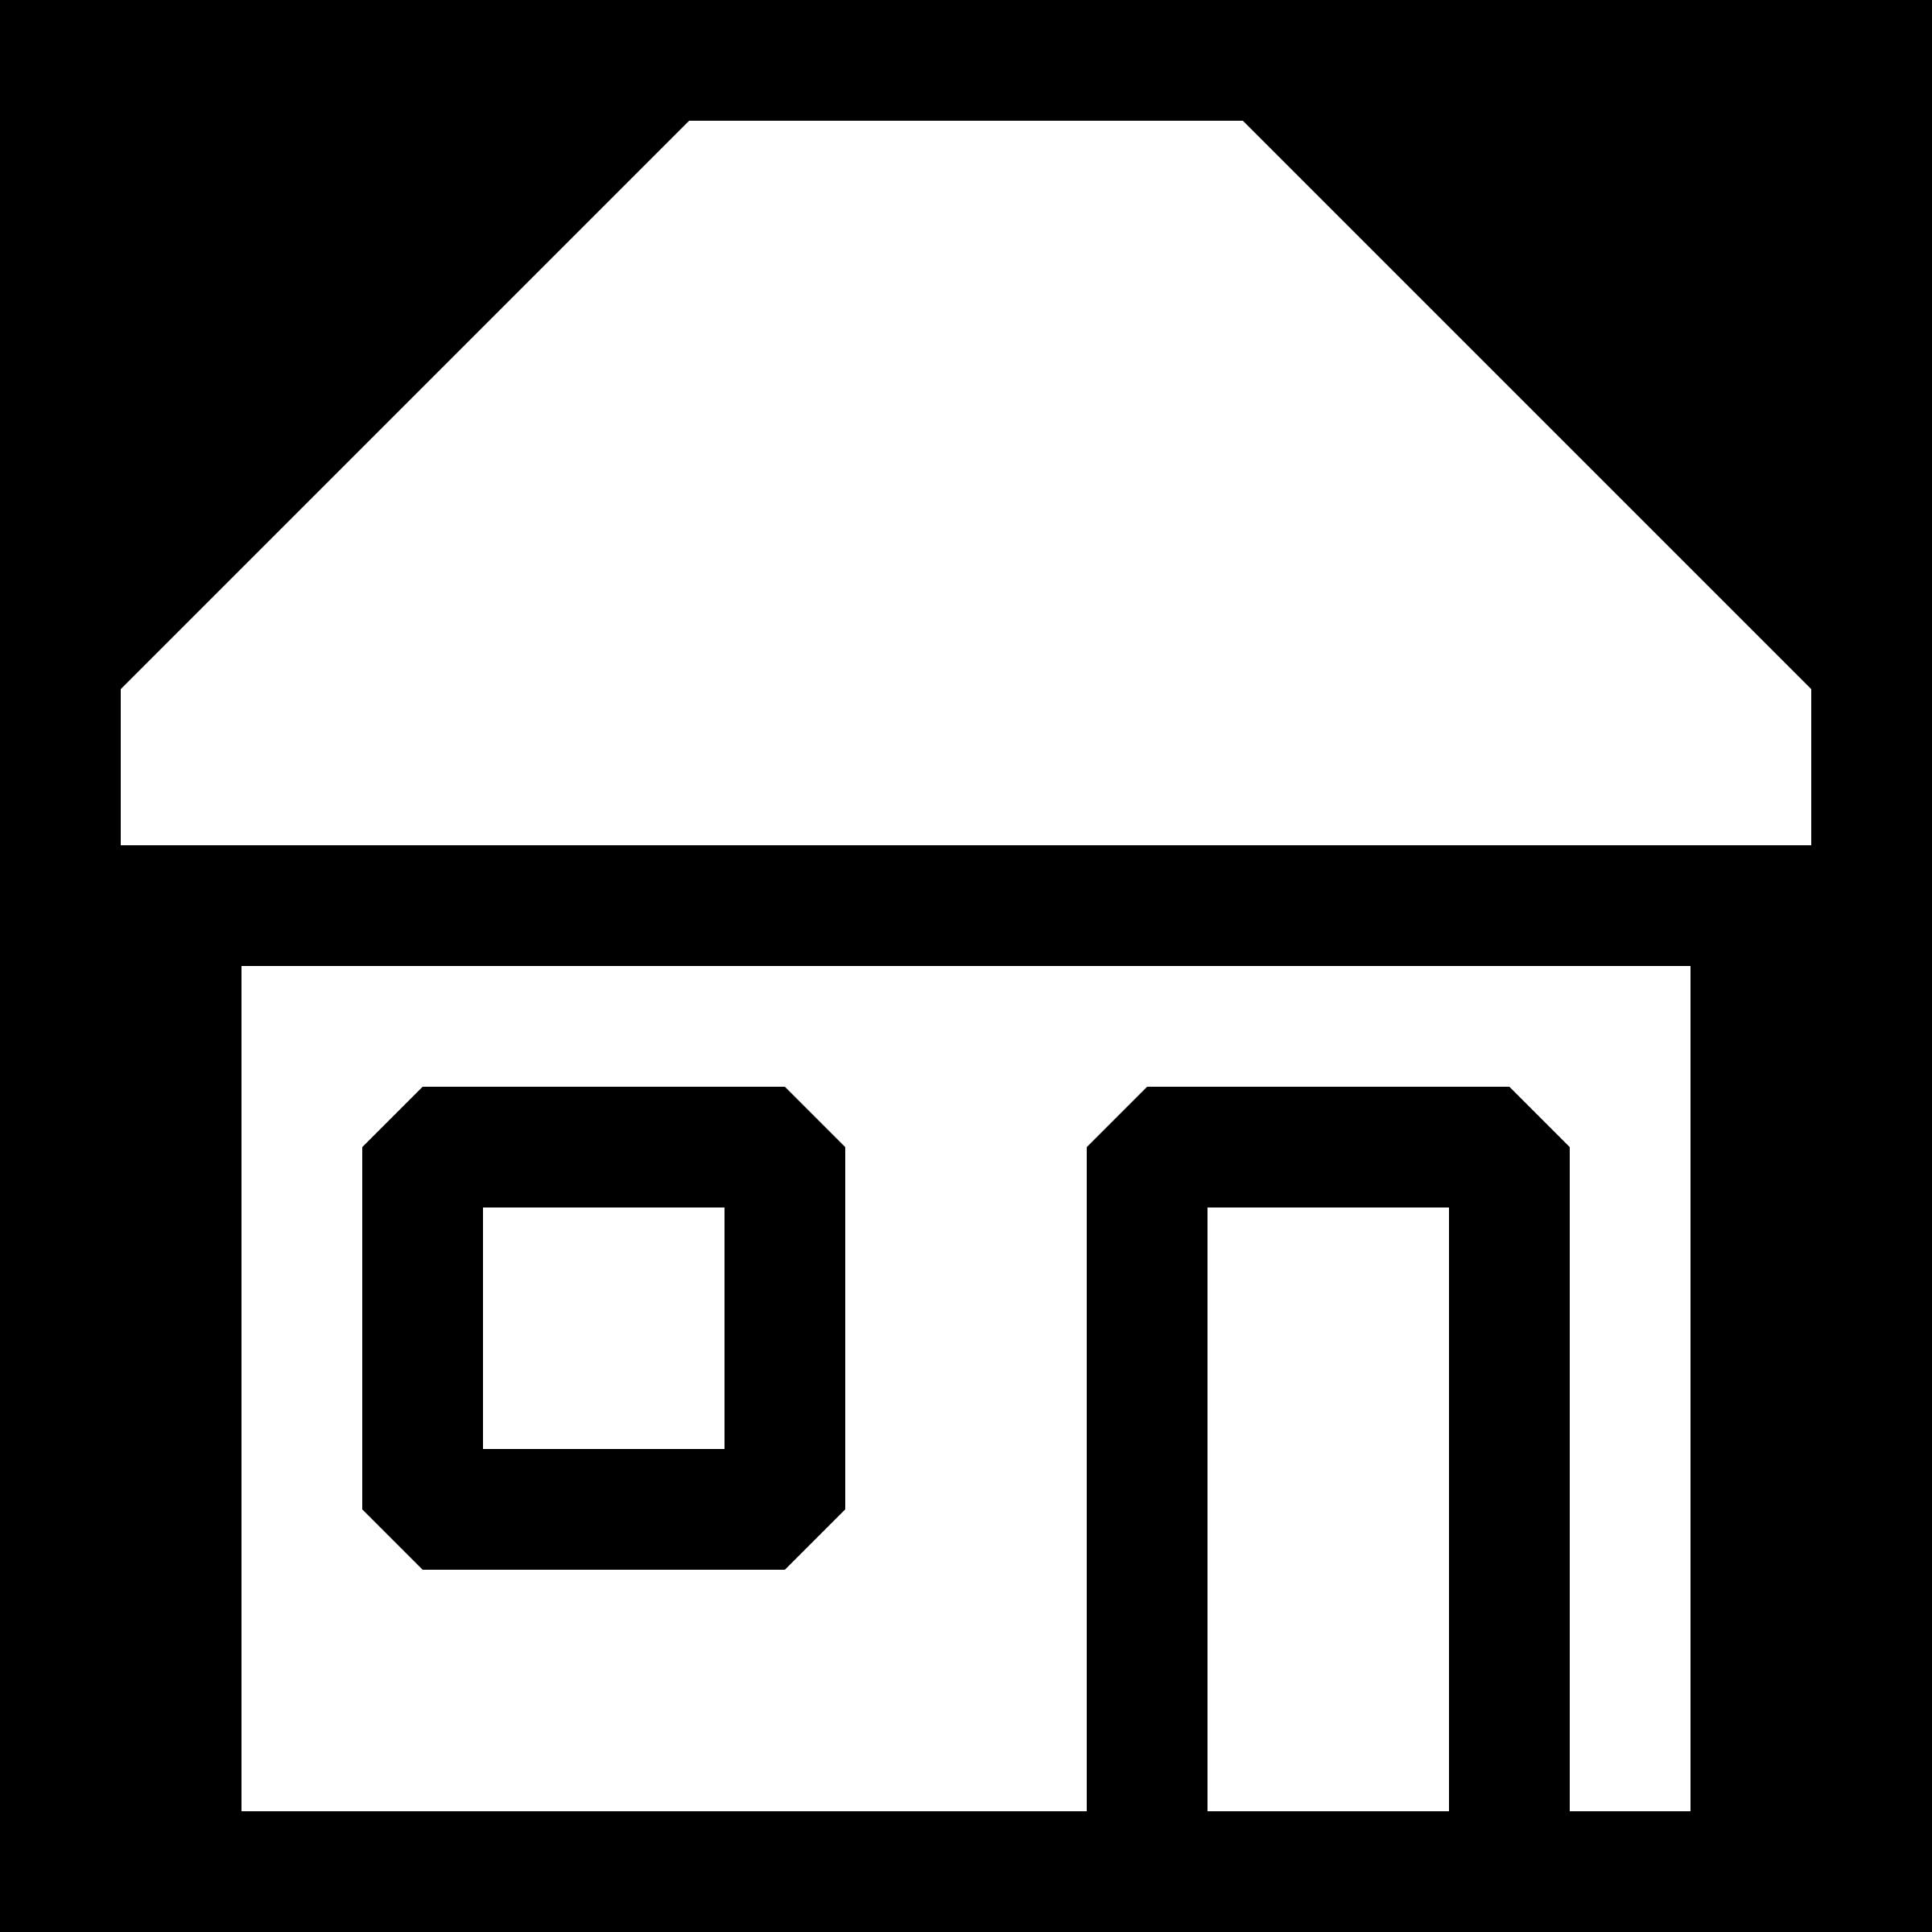 Buildings clipart simple. X px capable black